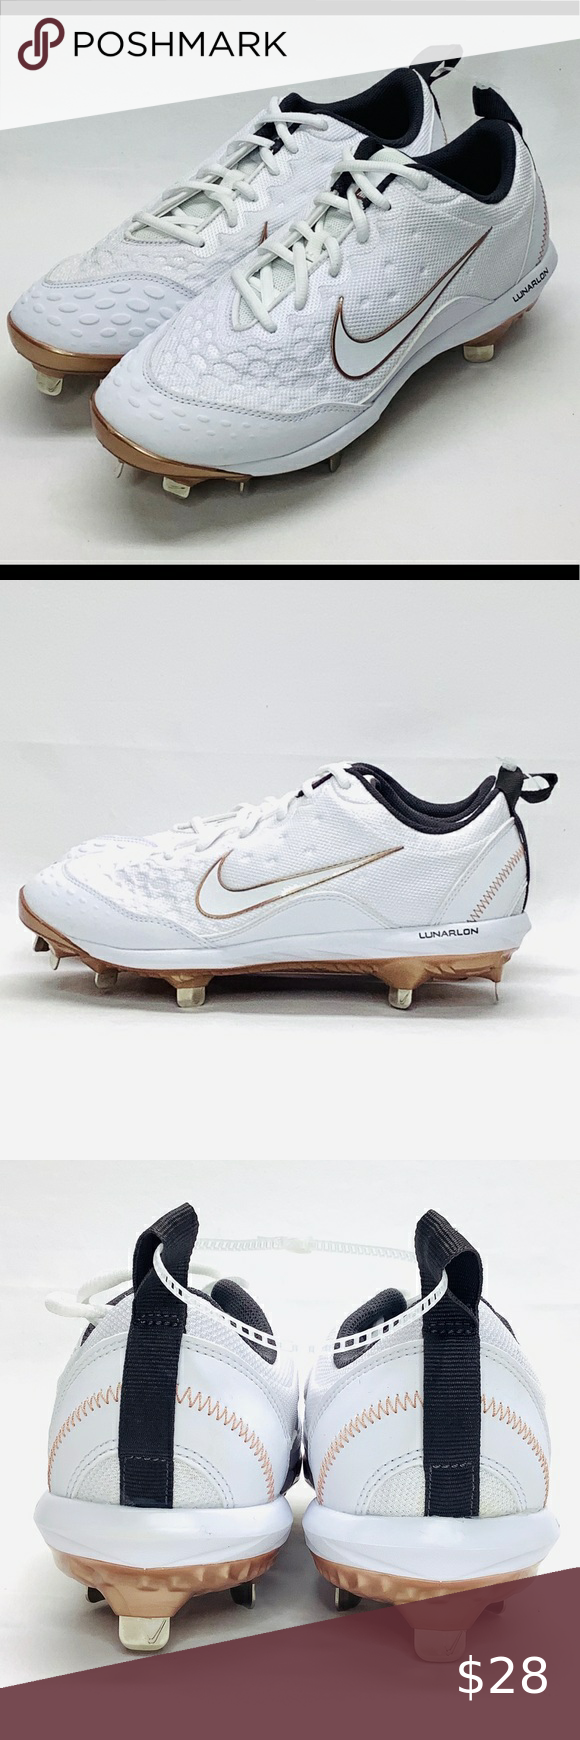 Nike Lunar Hyperdiamond 2 Size 9 Softball Cleats Nike Lunar Hyperdiamond 2 Size 9 Pro Metal Softball Cleats 856492-109 Men's Nike Shoes Sneakers